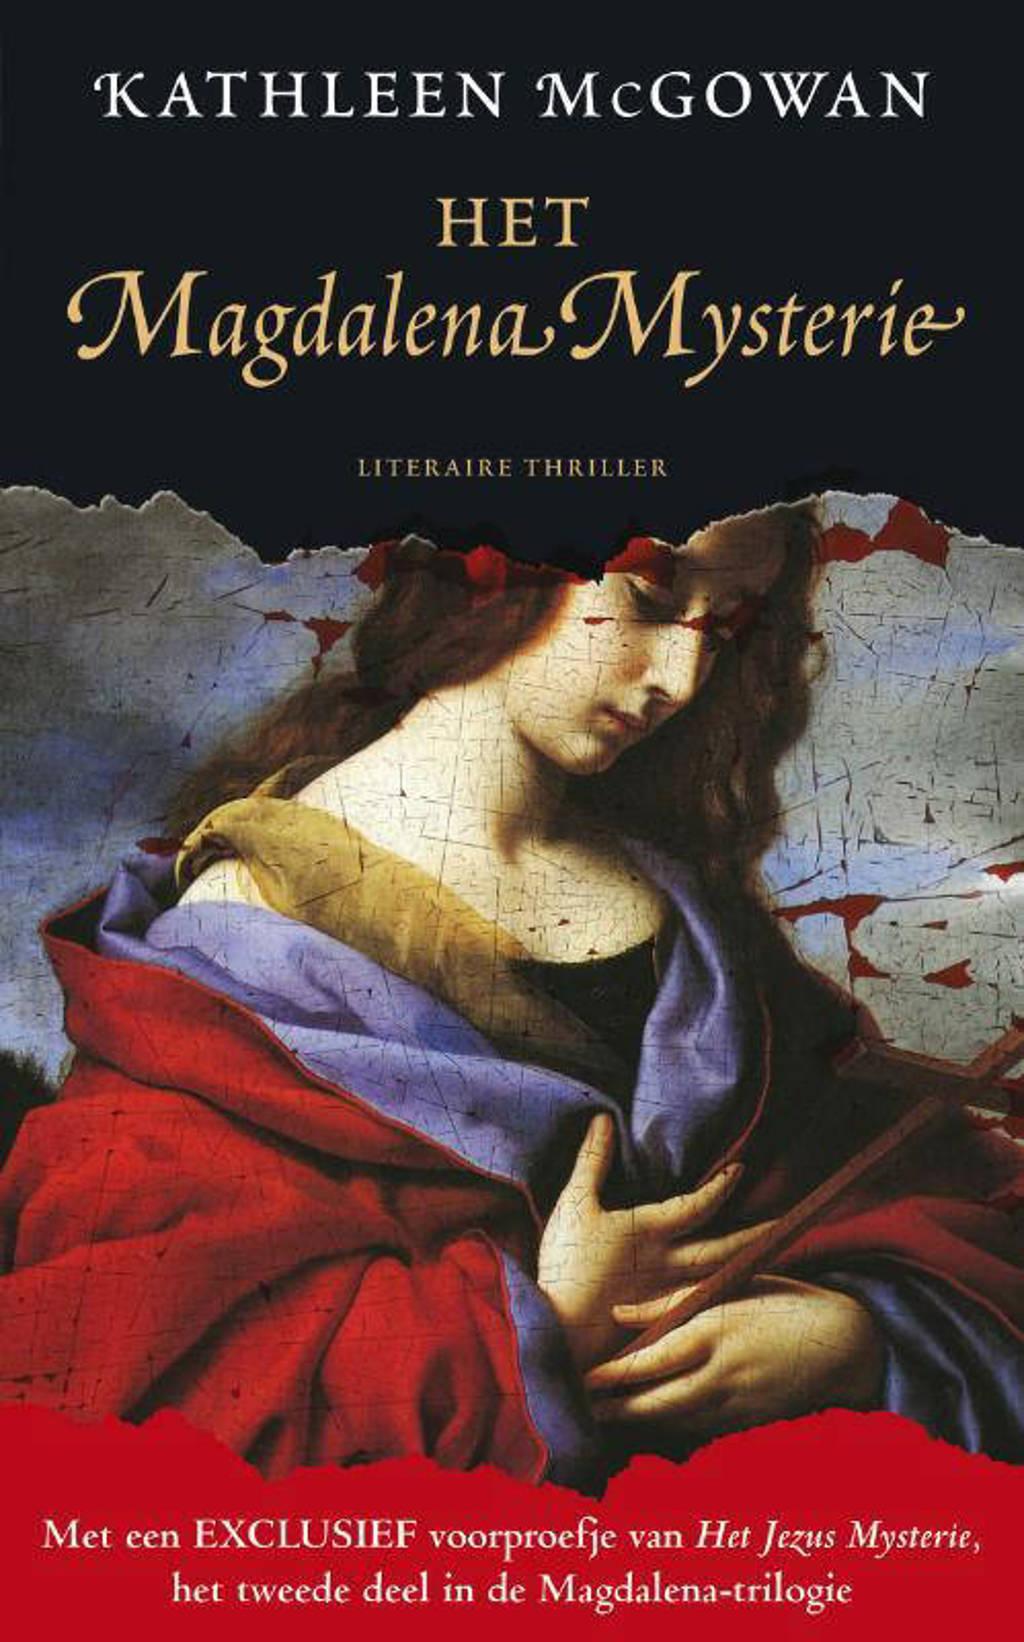 De Magdalena trilogie: Het Magdalena mysterie - Kathleen McGowan